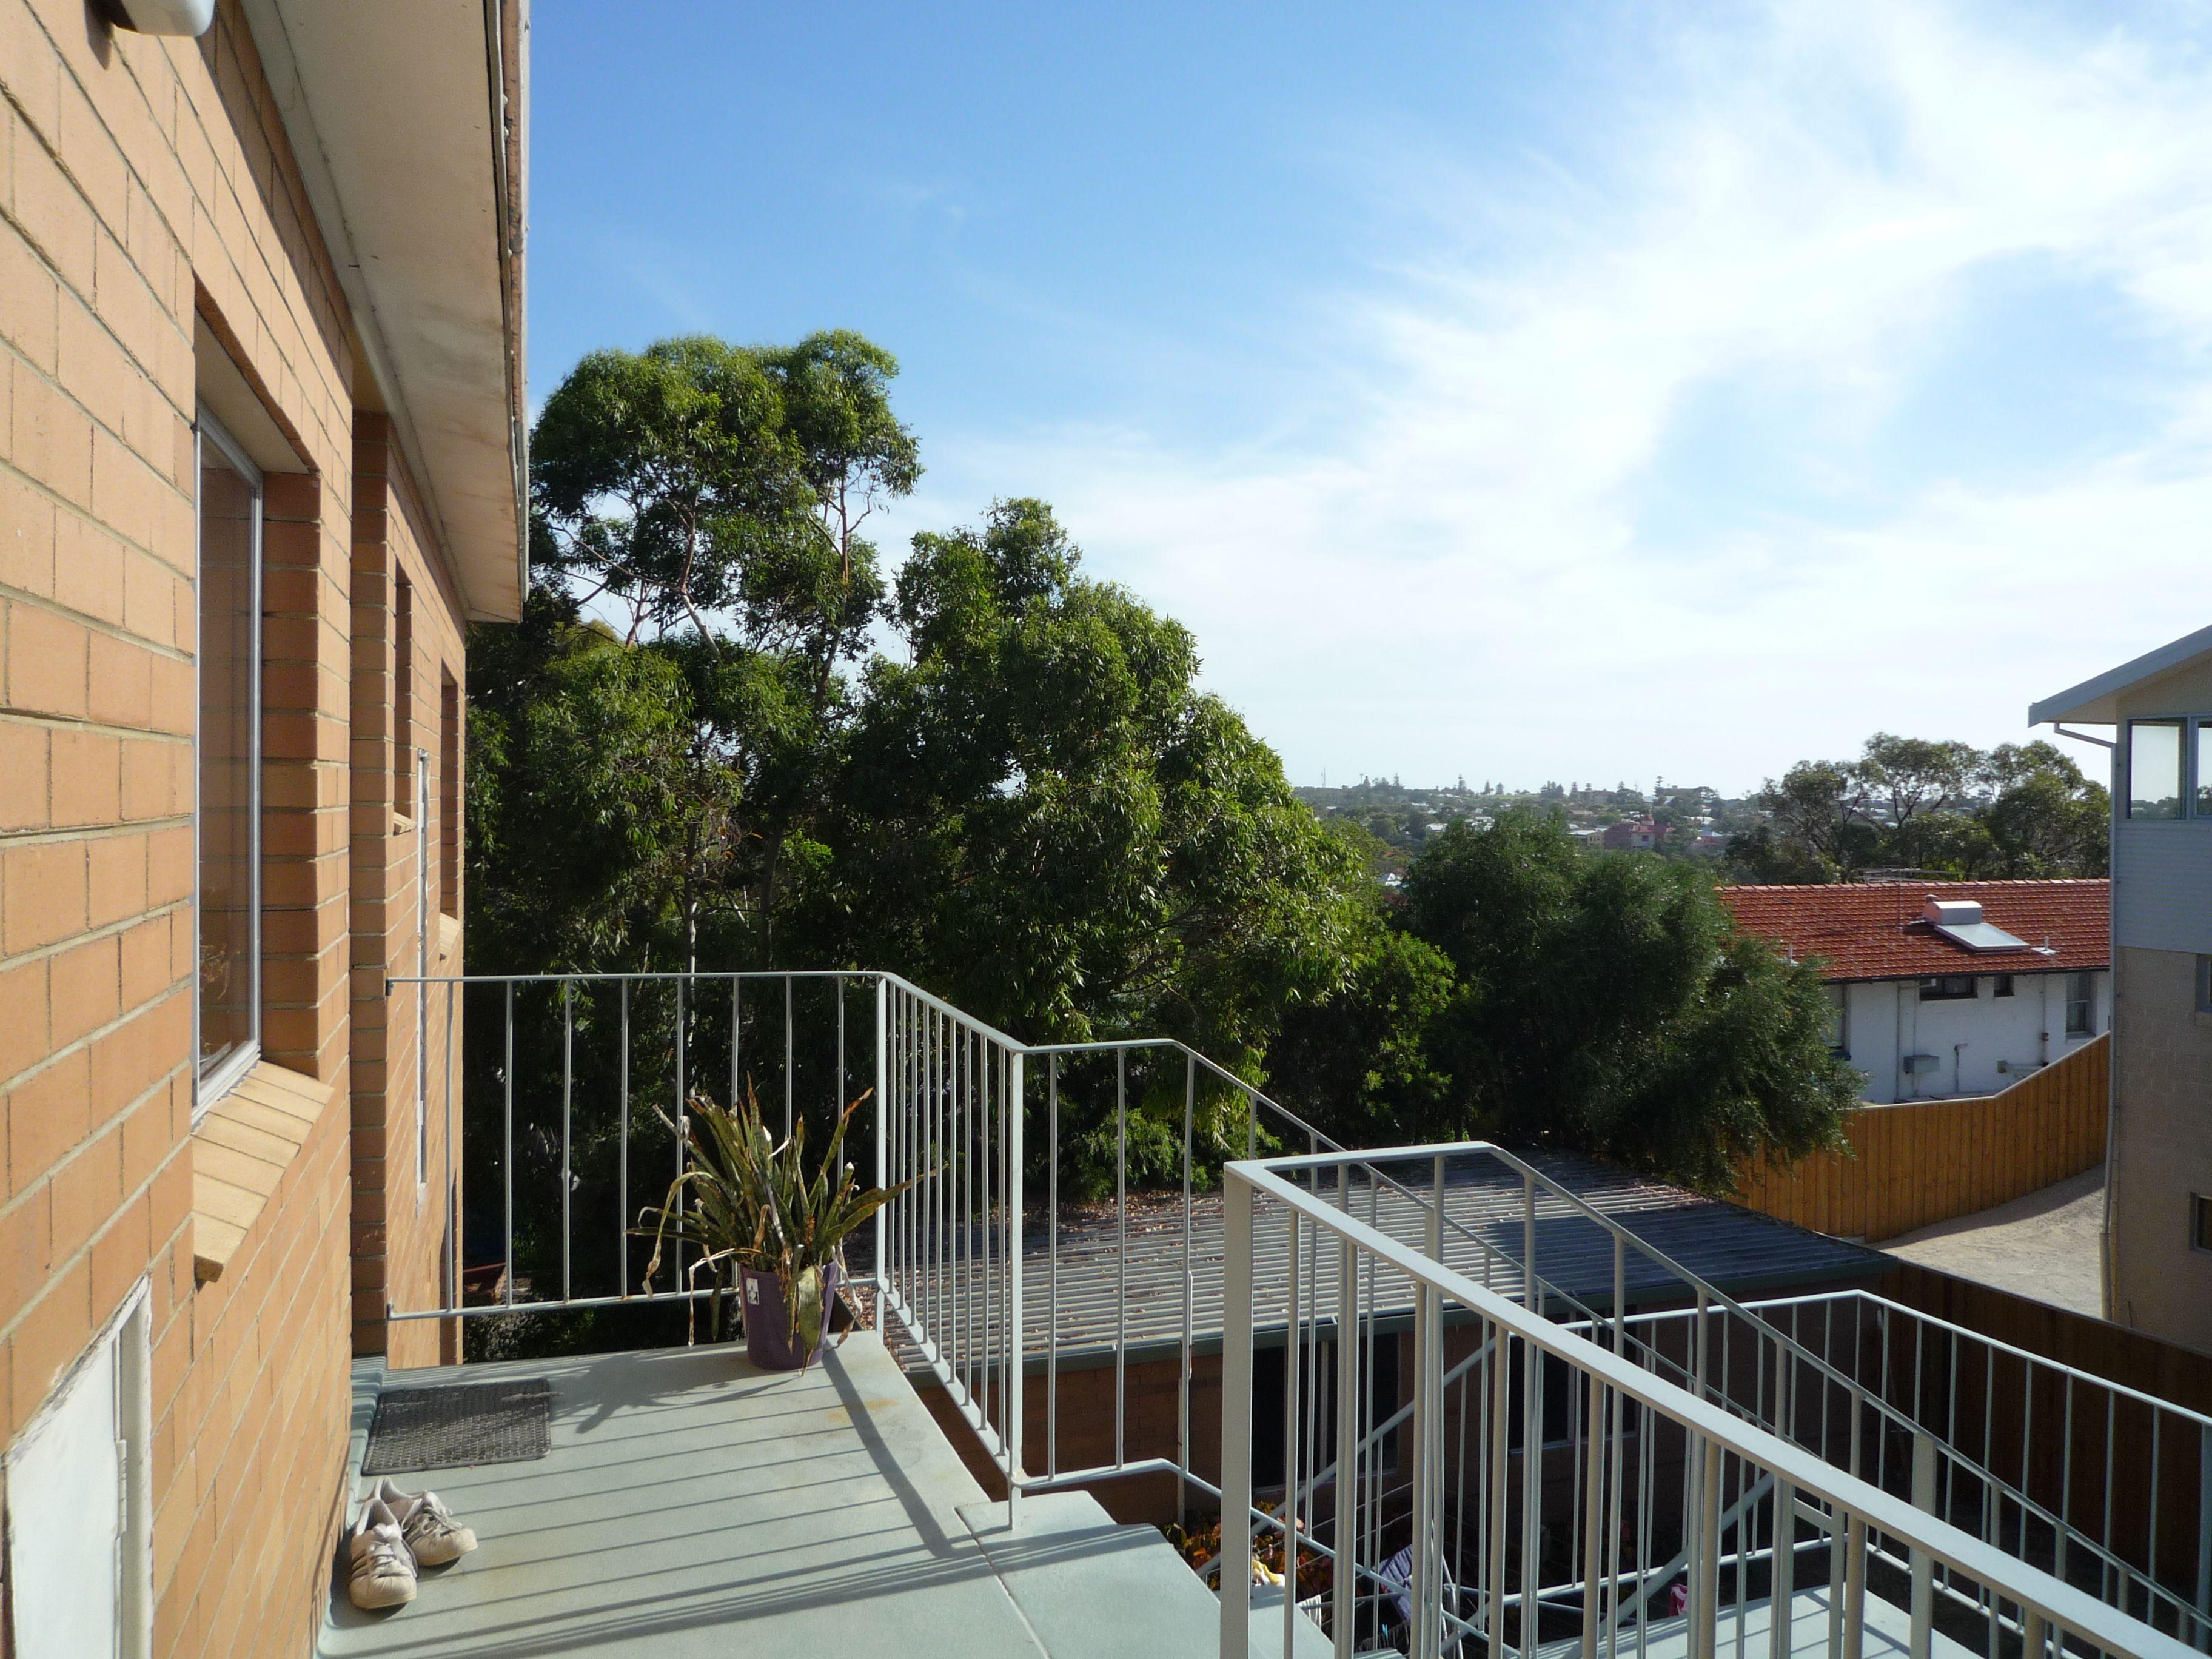 31/37 Osbourne Road, East Fremantle